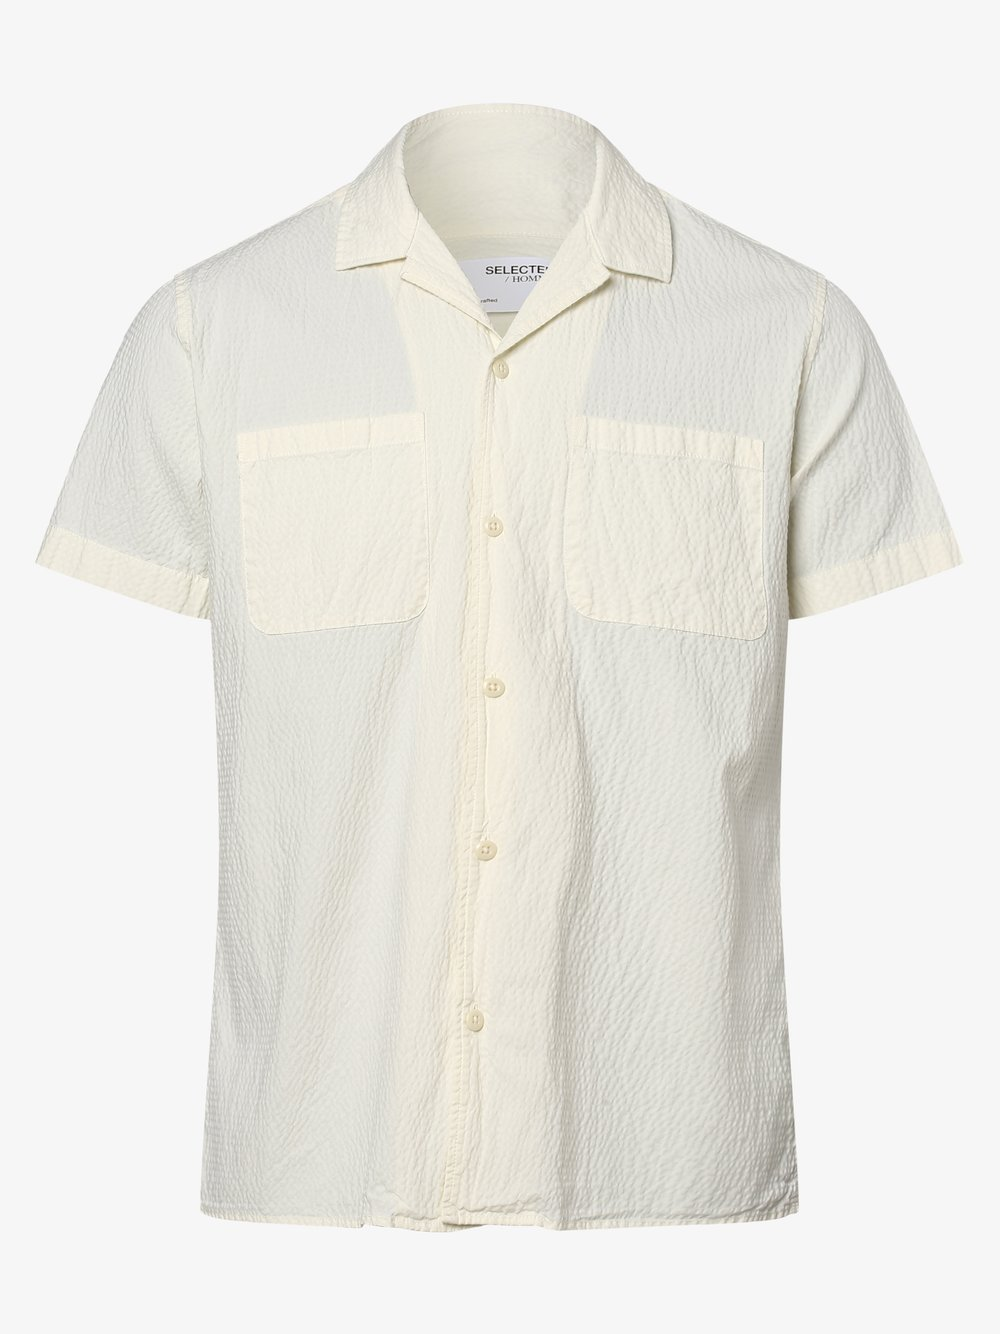 Selected - Koszula męska – SLHRegdeclan, niebieski